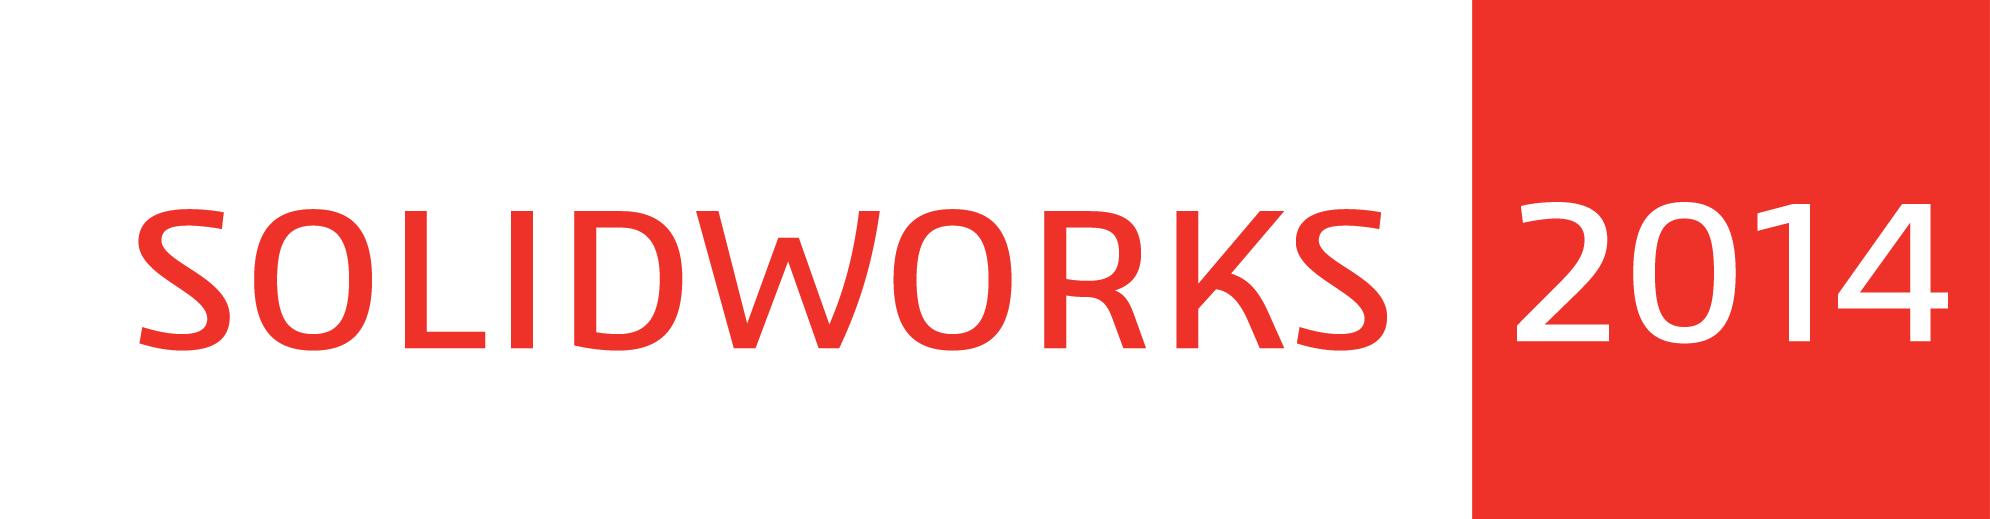 Solidworks Logos